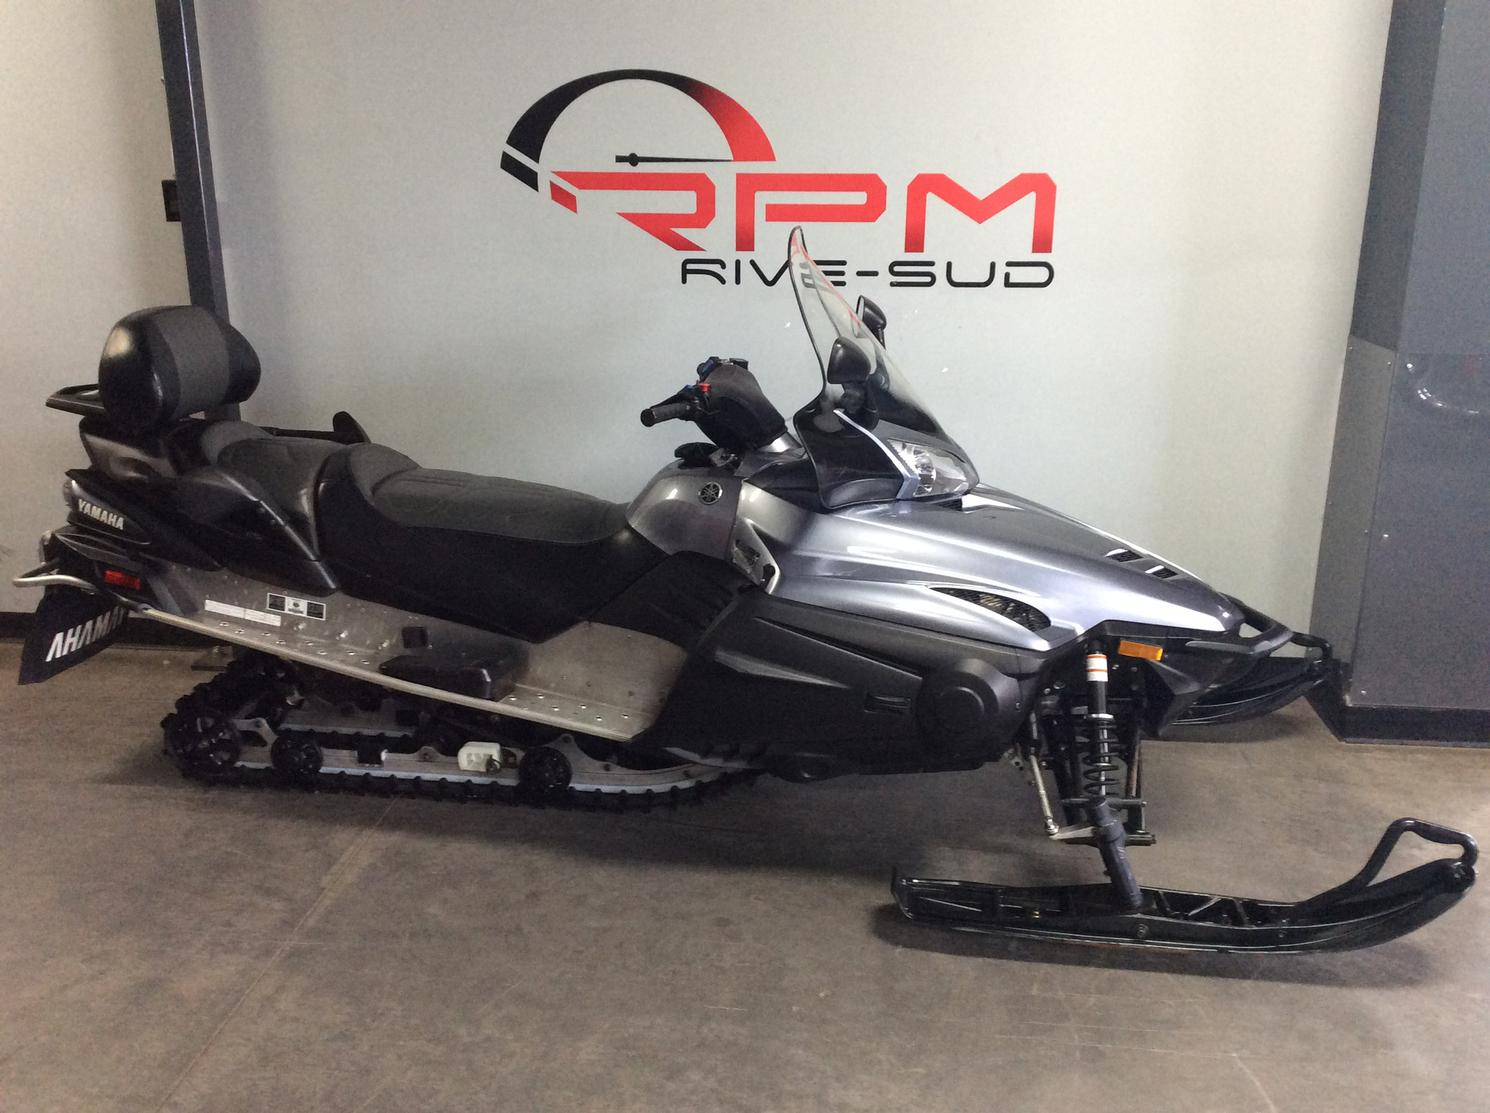 2011 Yamaha Rs Venture RST90AS